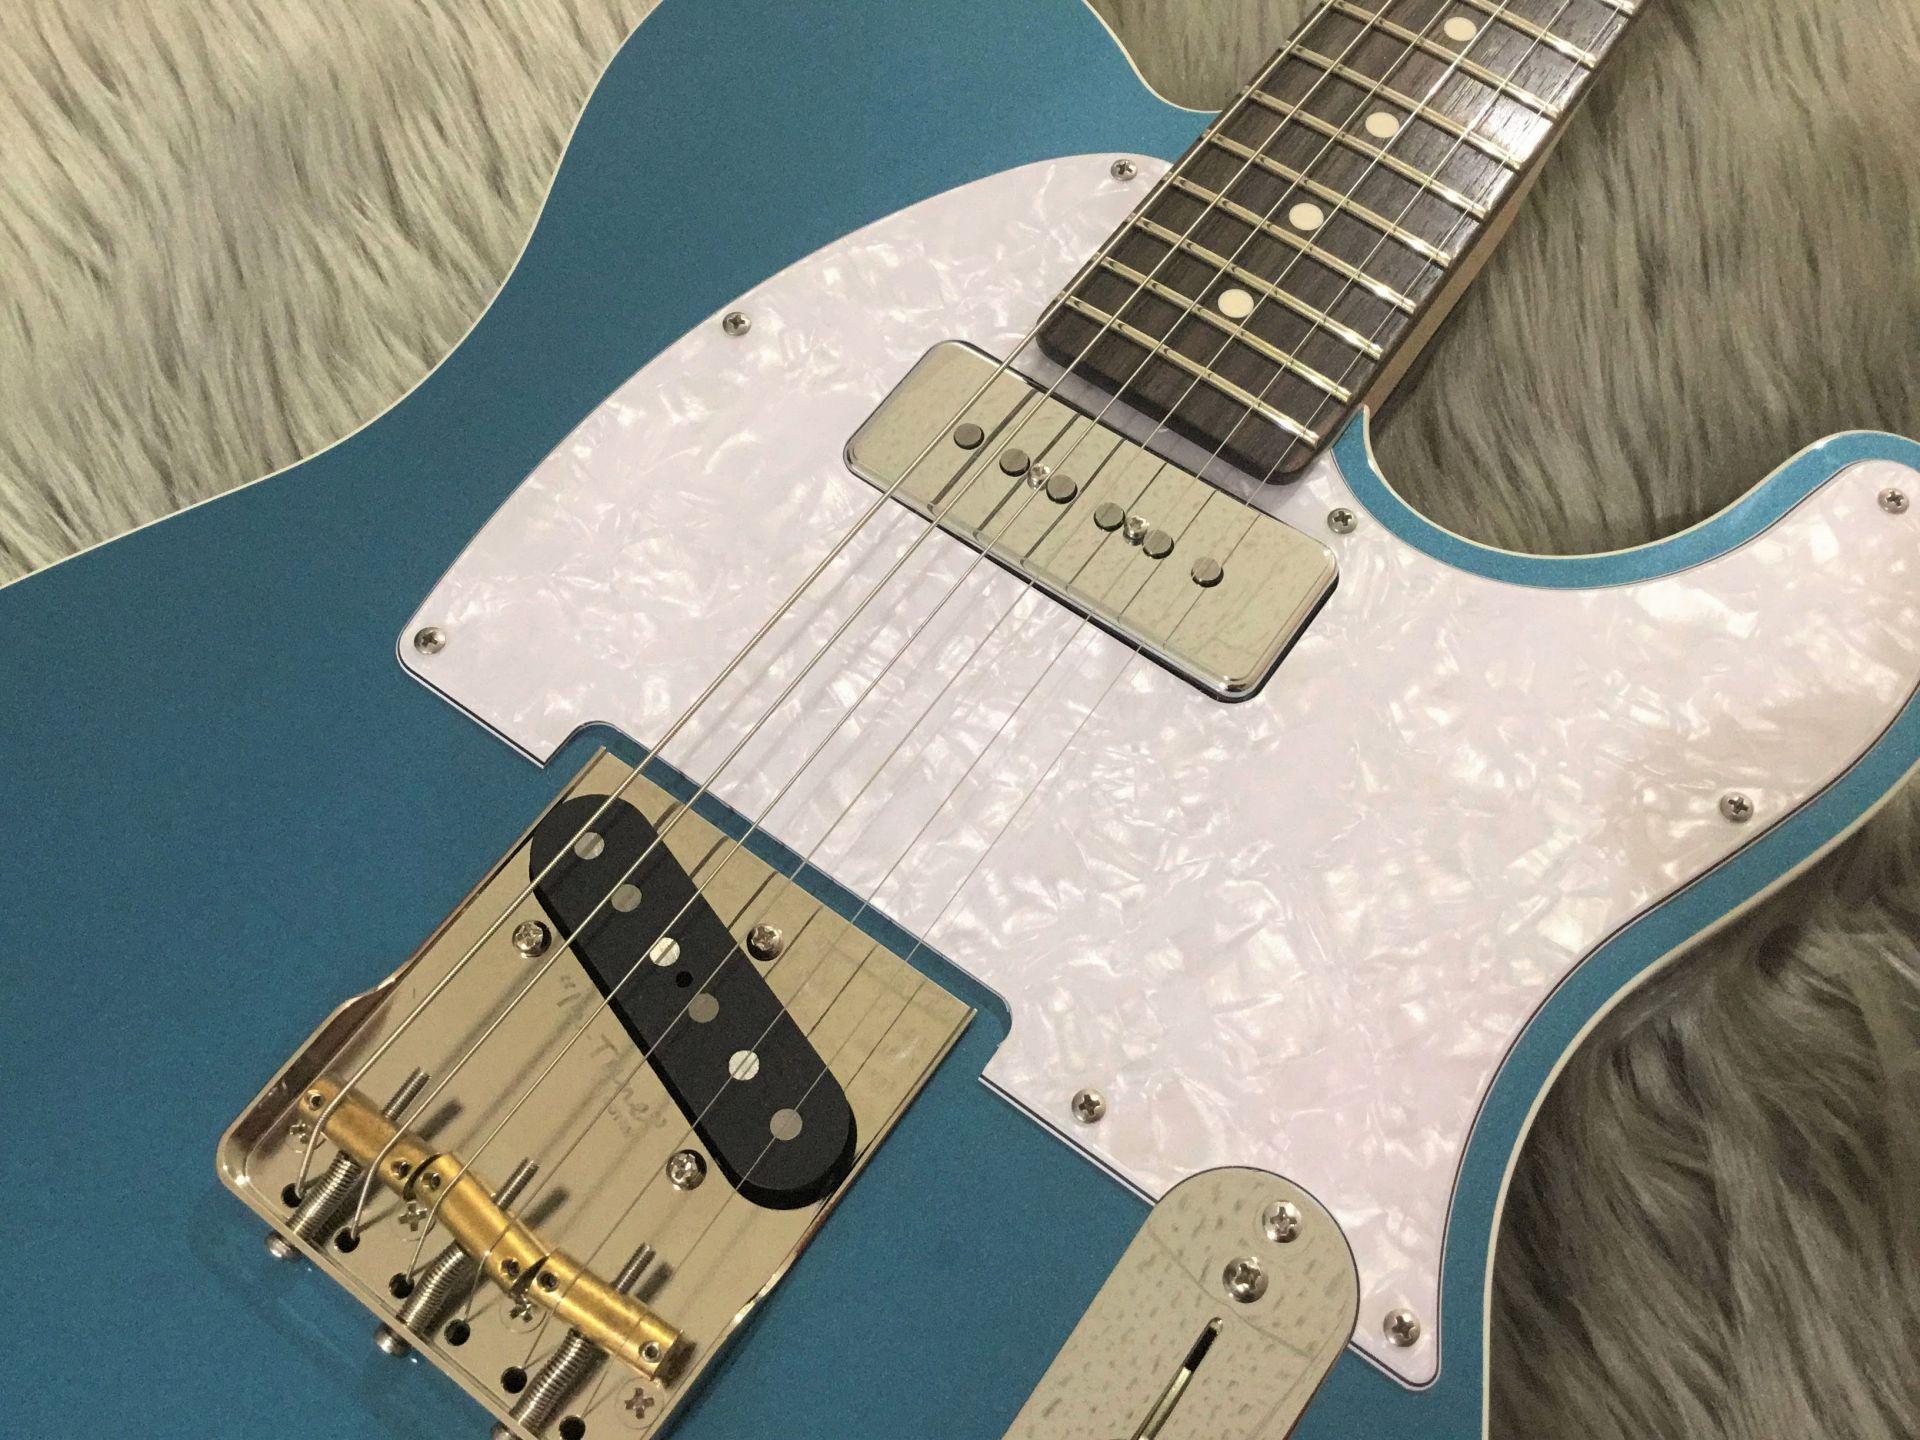 【7本限定】Standard-T / Neon Blue Metallicの全体画像(縦)